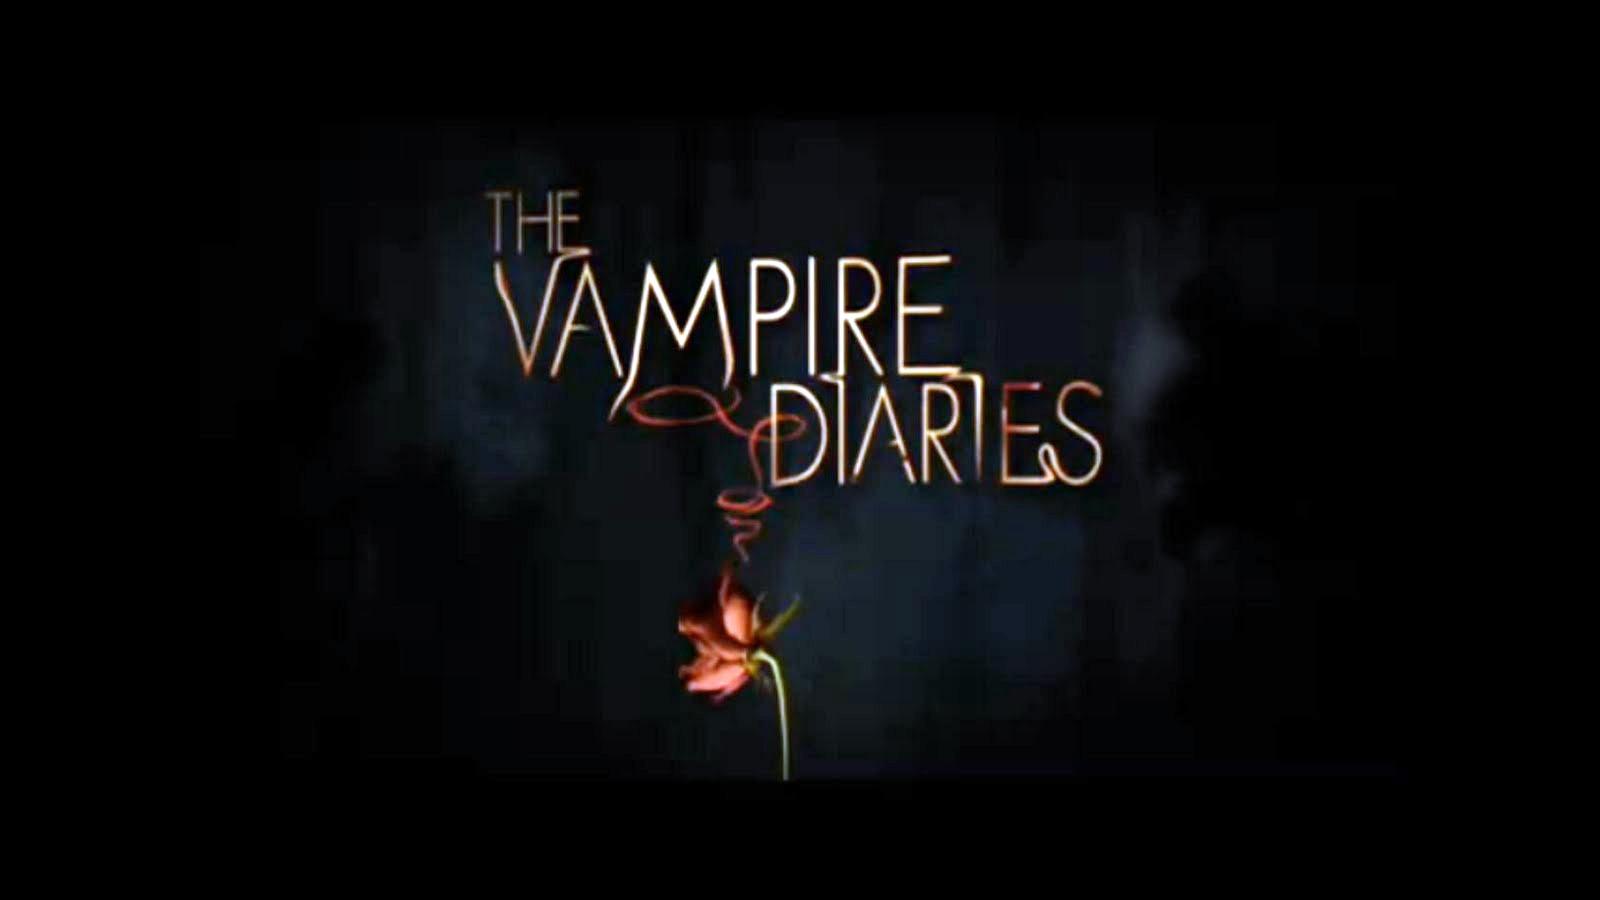 http://2.bp.blogspot.com/-qxxO58C30pU/TrCRL9eW-OI/AAAAAAAAAhI/mbPdlyap9Vo/s1600/The-Vampire-Diaries-Logo.jpg